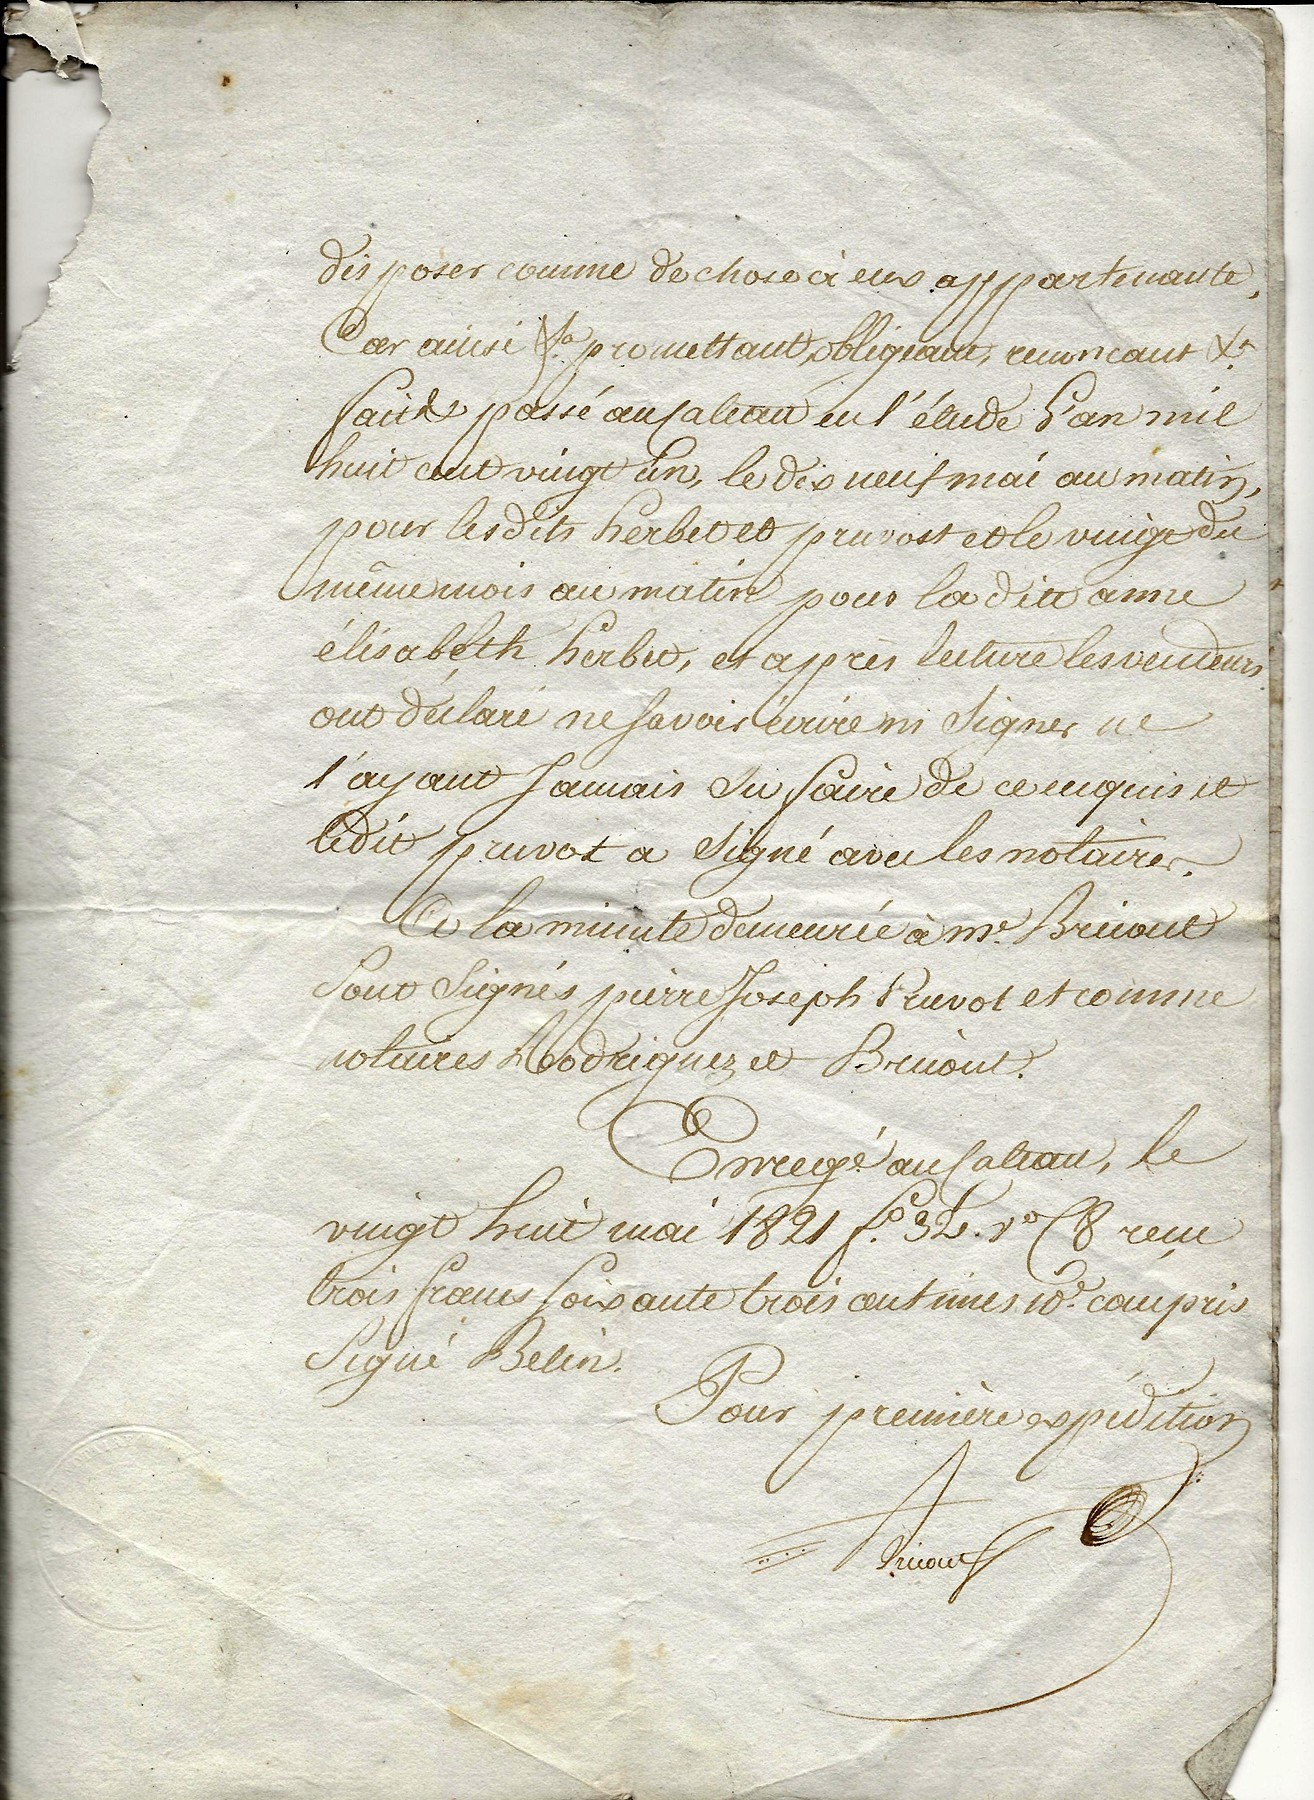 1821 vente herbet a pierre joseph pruvot 003